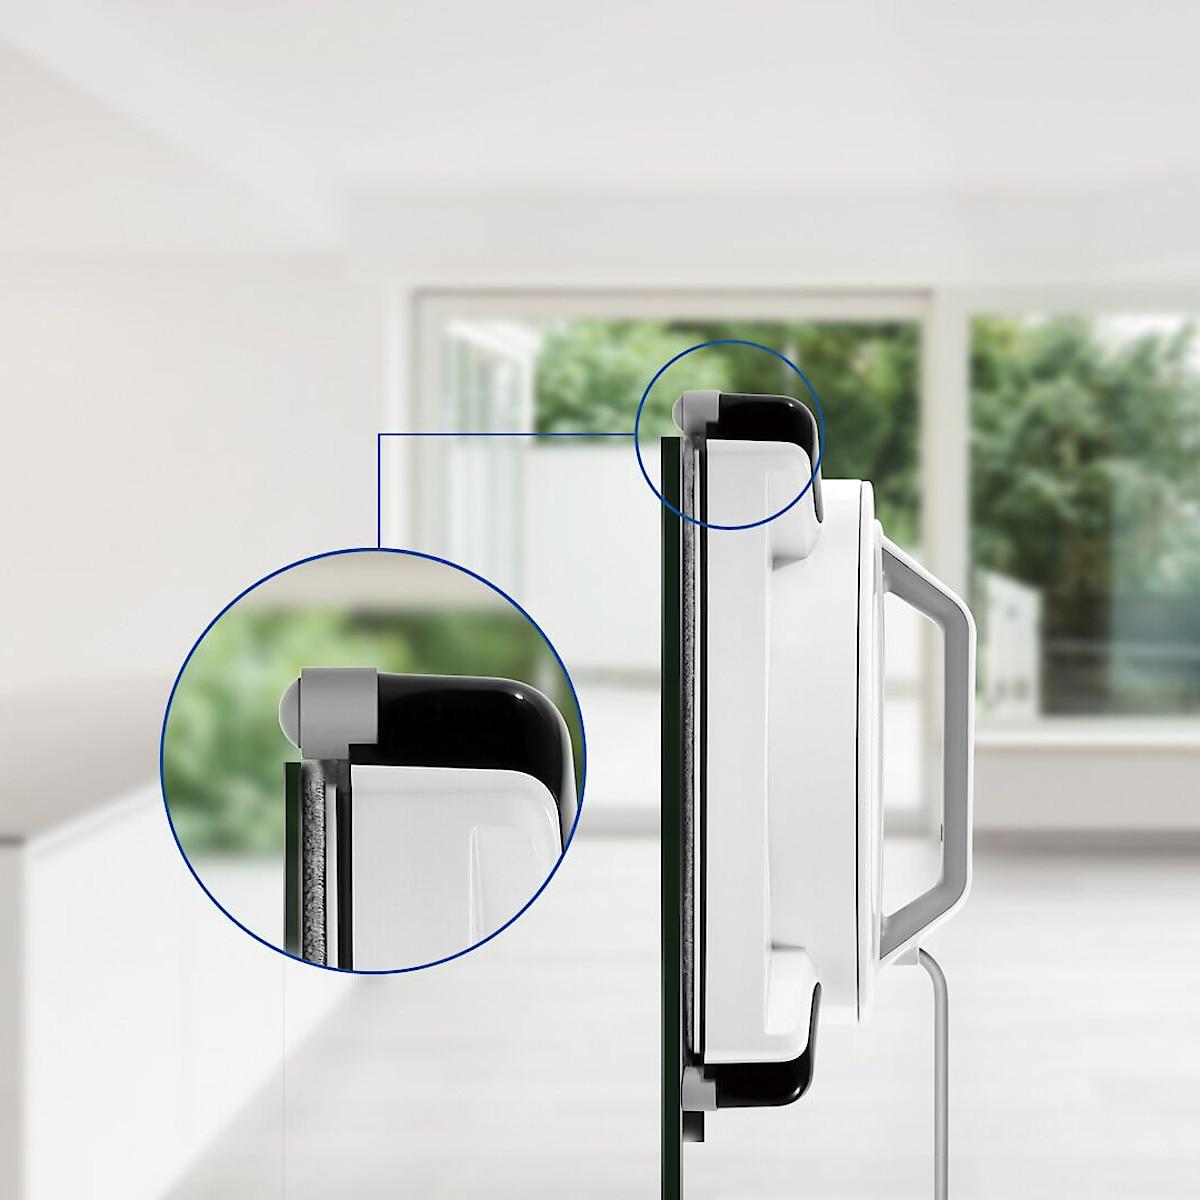 Ecovacs Winbot 950 vindusvasker